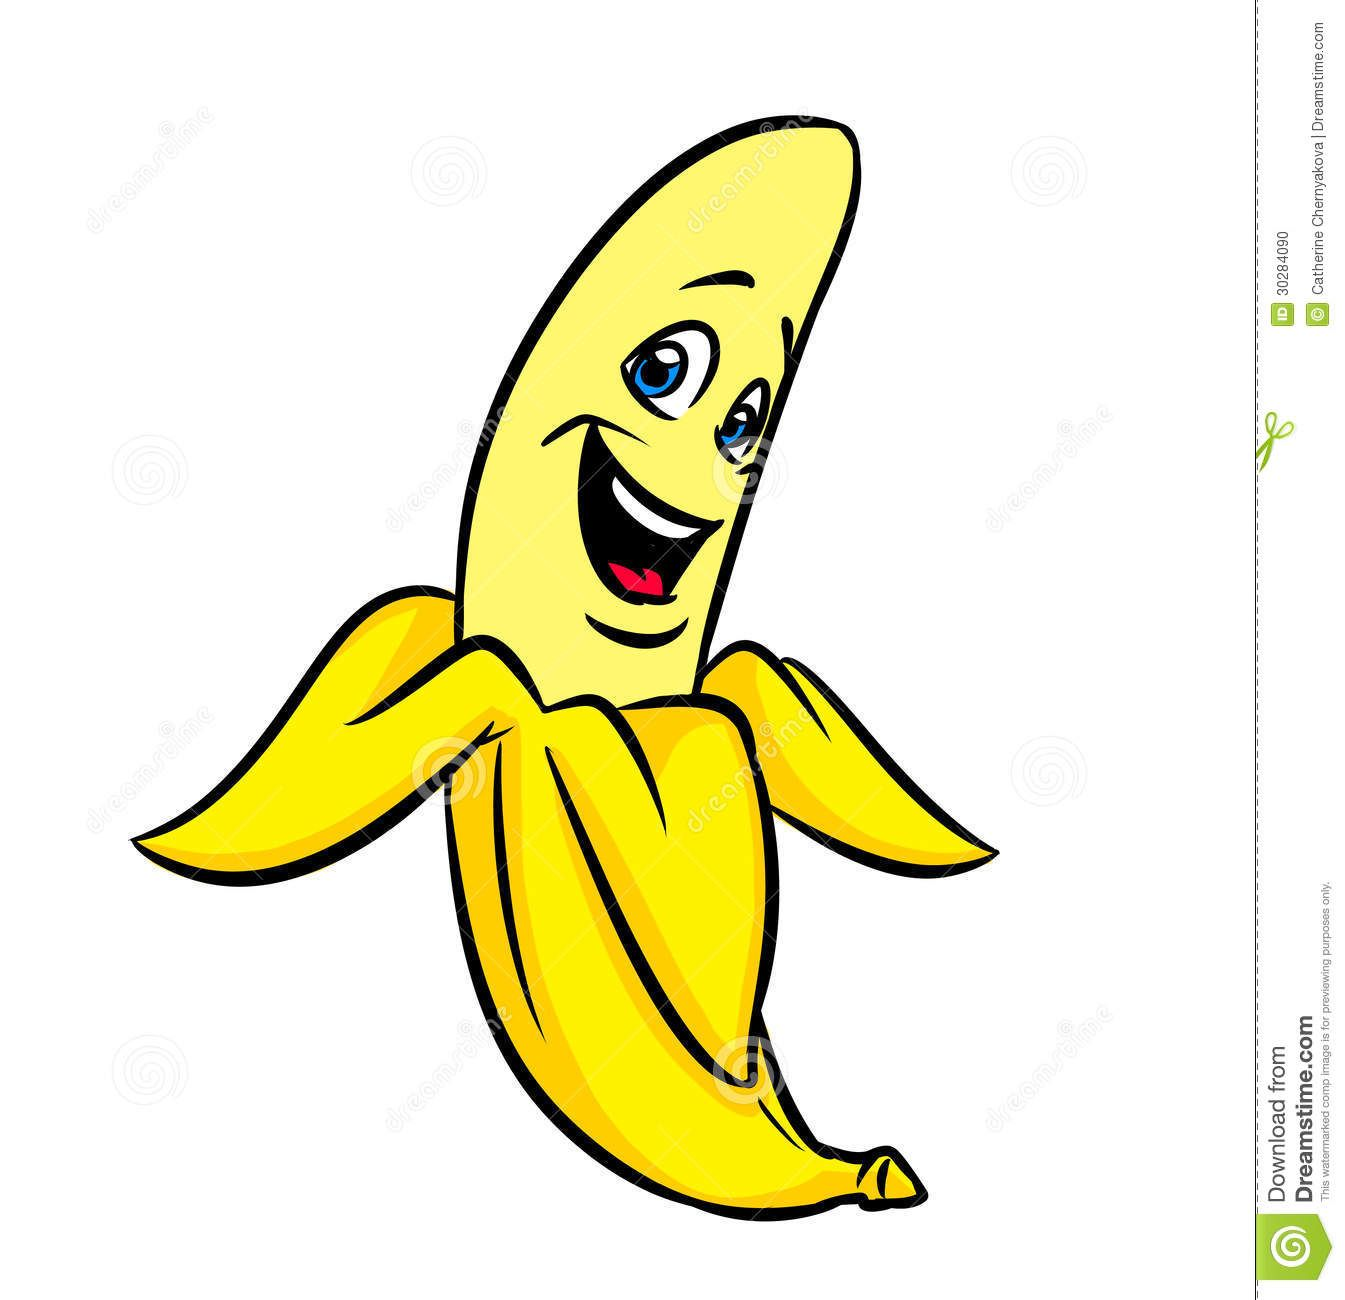 Google search phones pinterest. Bananas clipart banana face